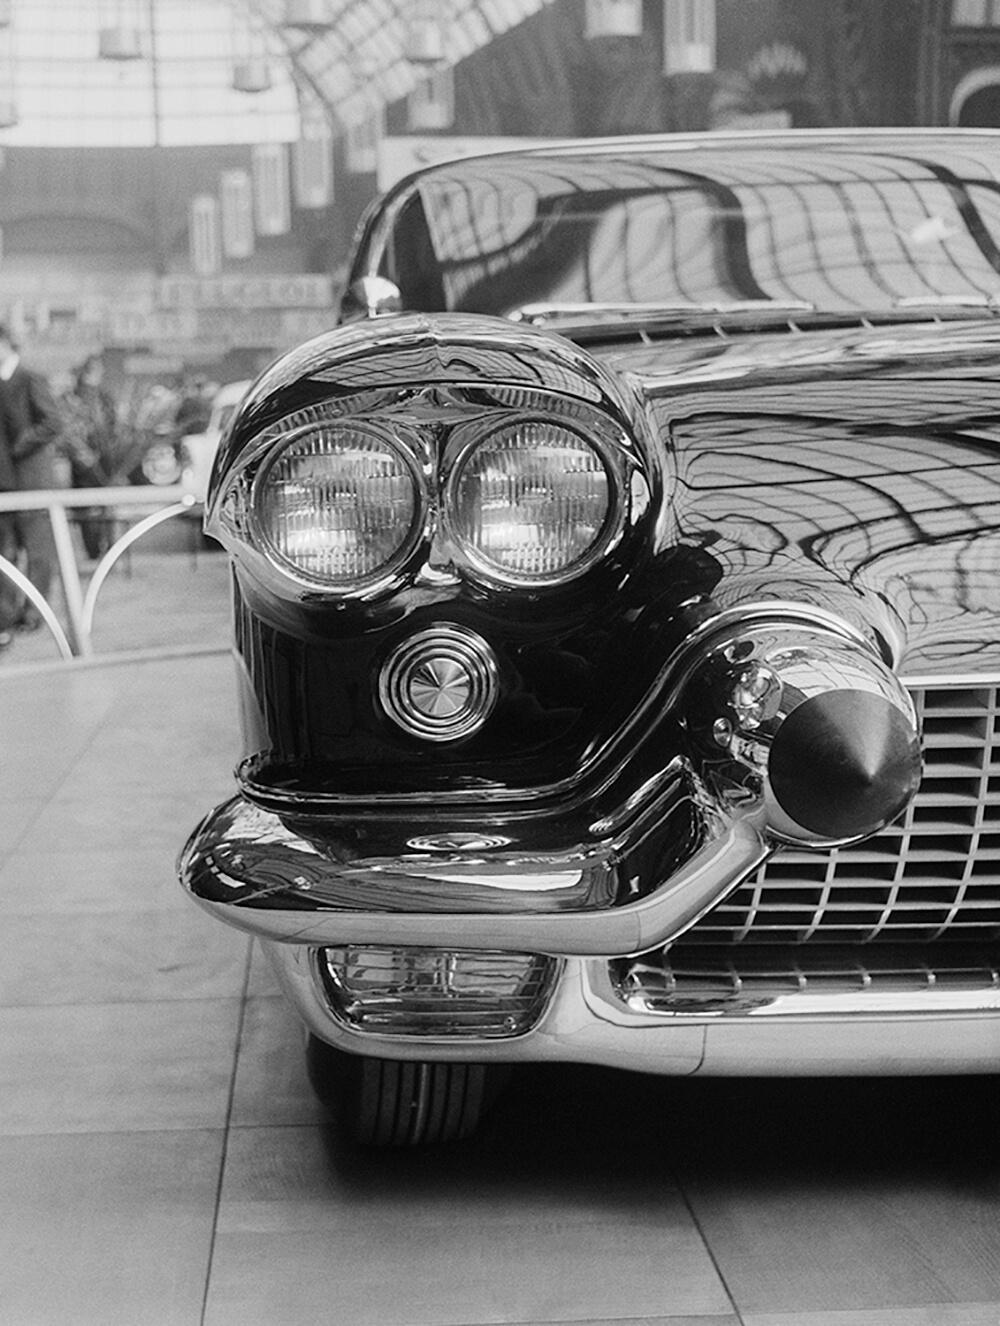 Cadillac fine art photography